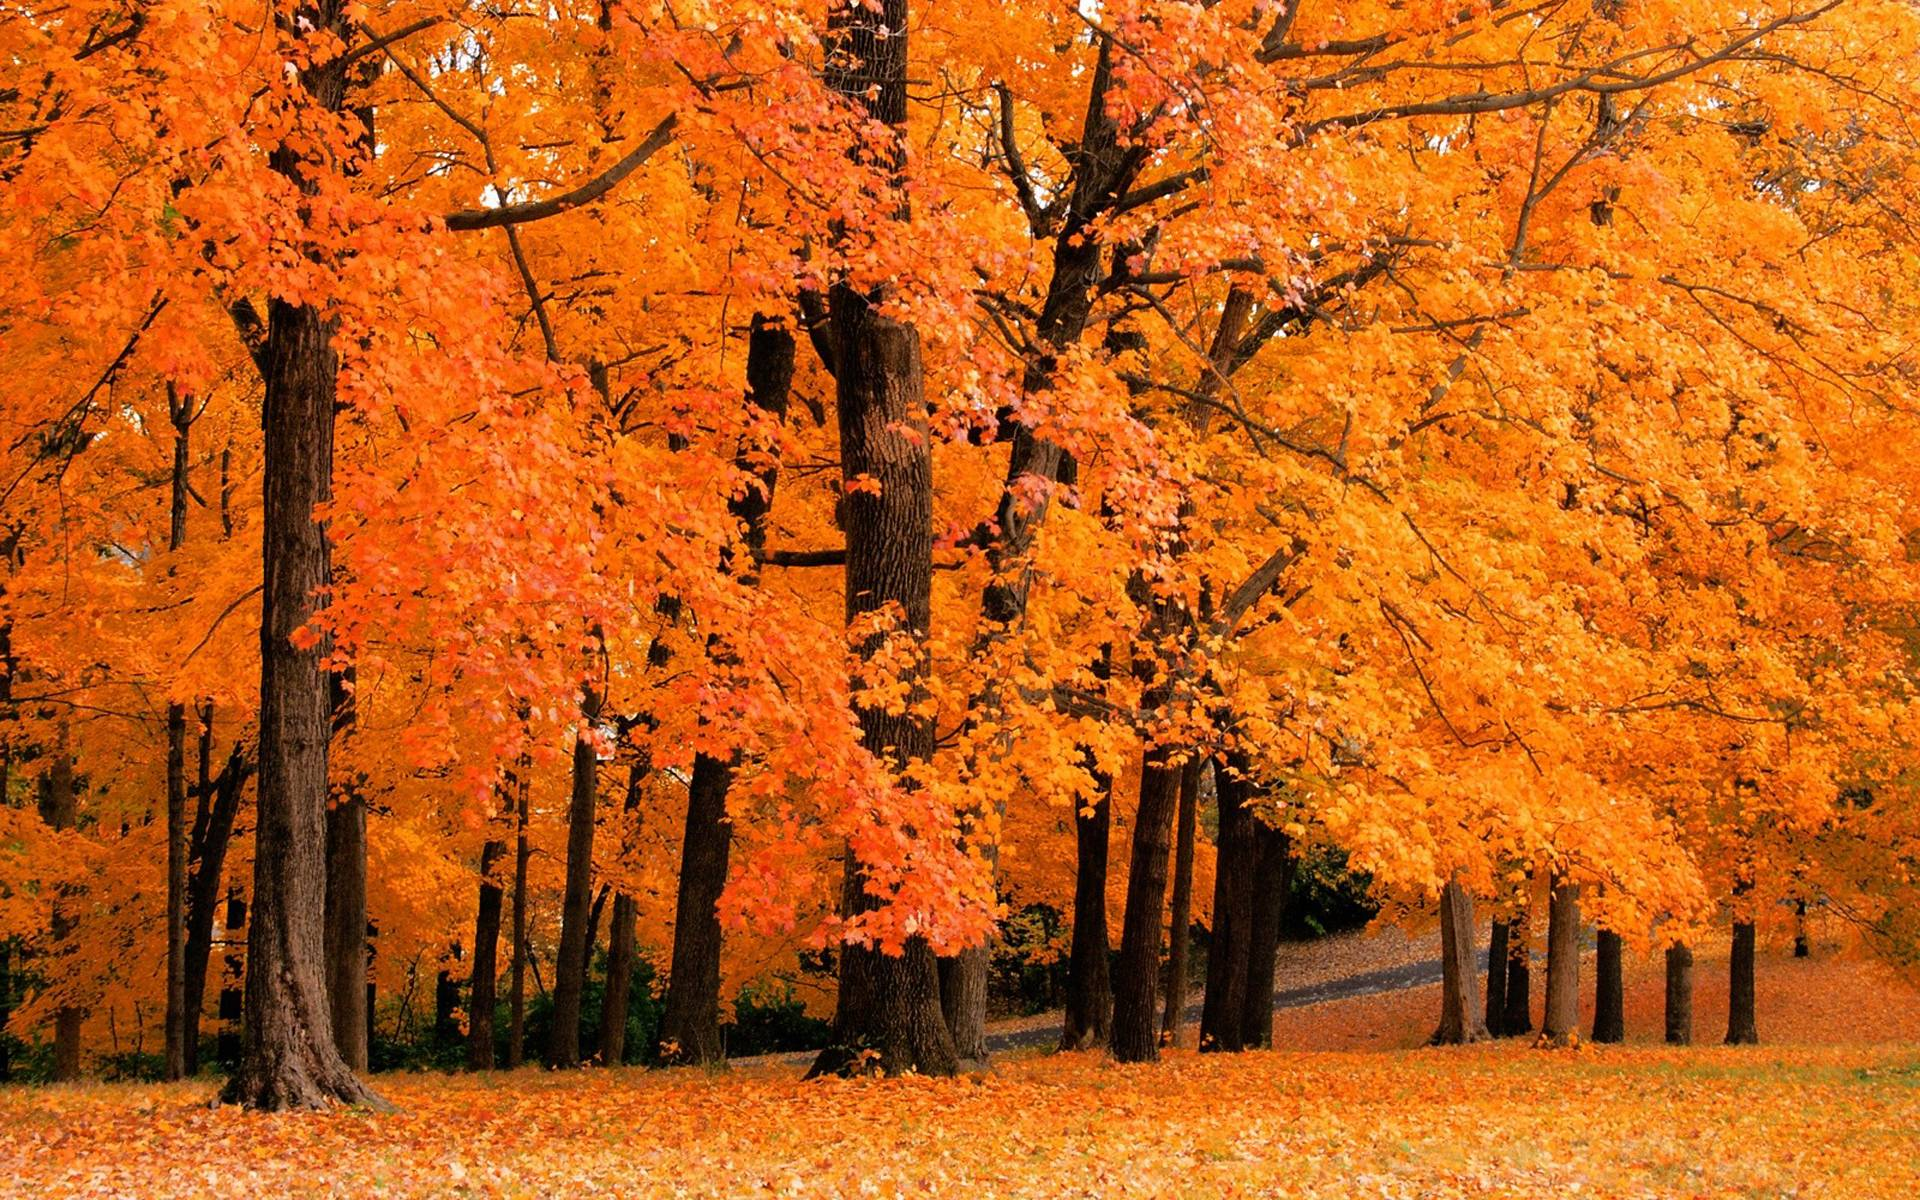 fall desktop background fall leaves desktop background Desktop 1920x1200